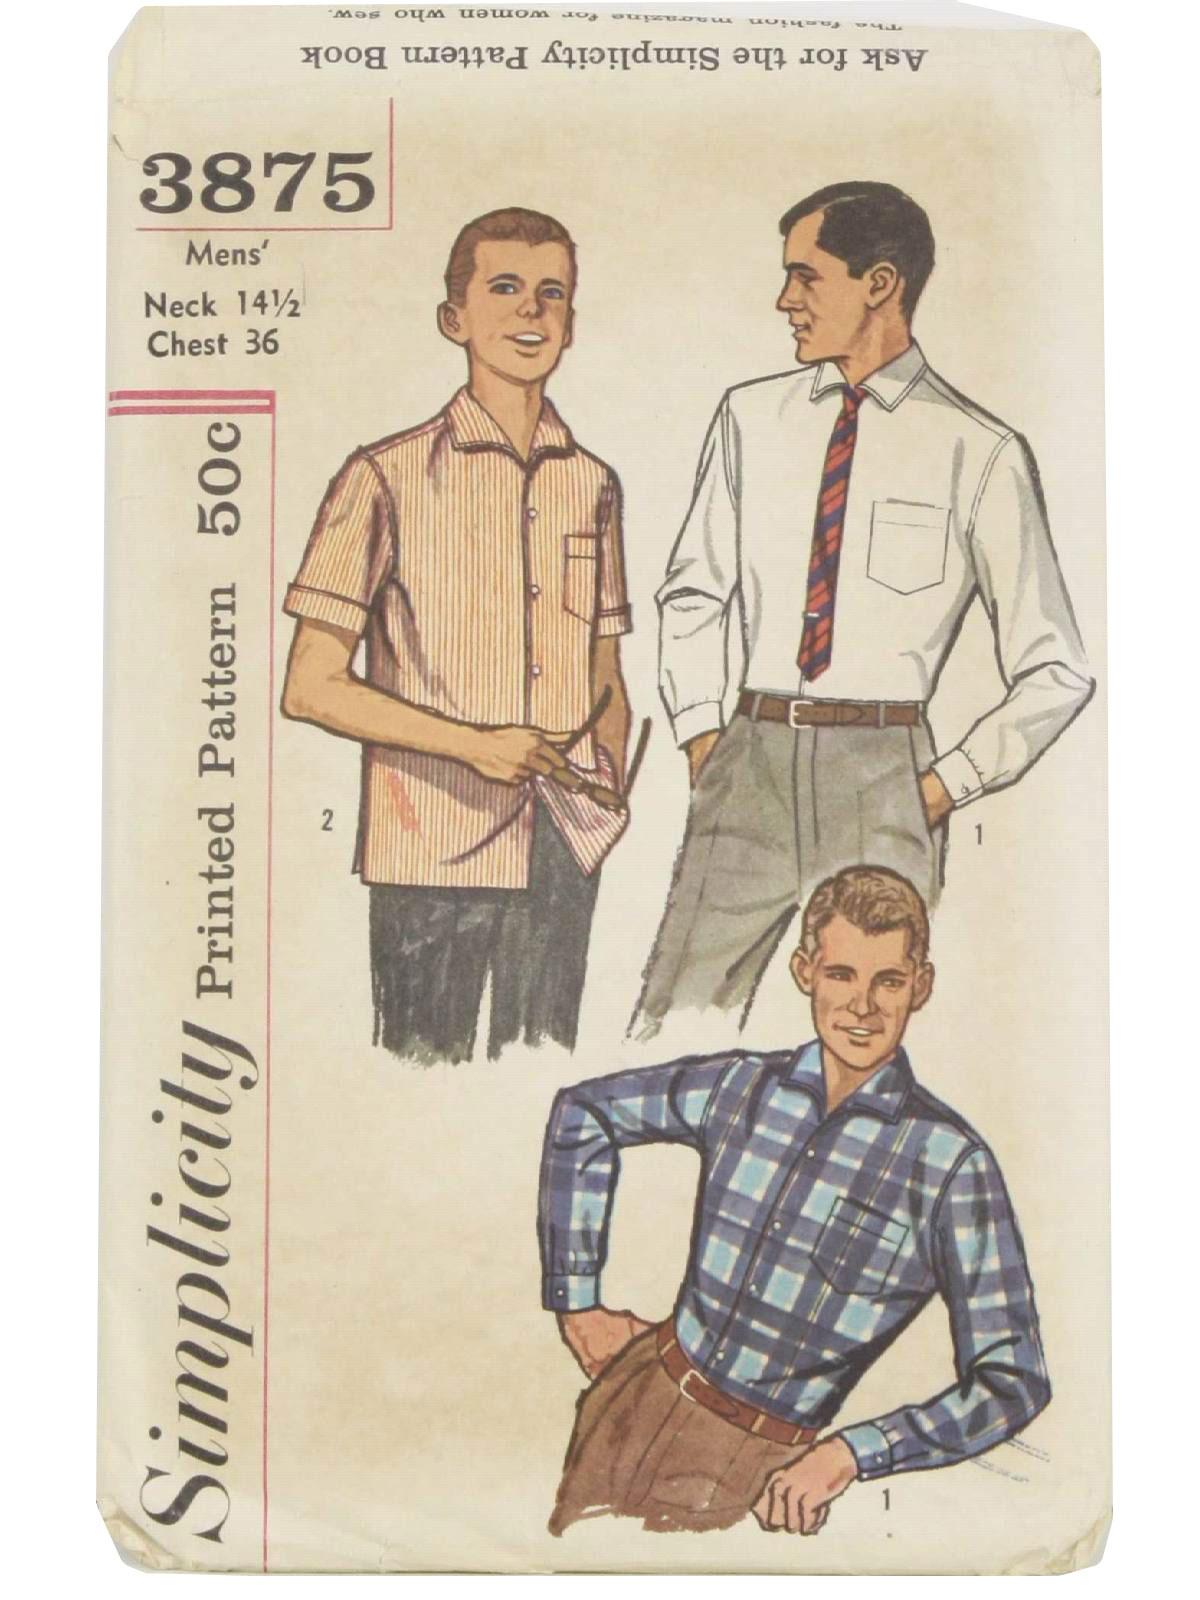 Womens Cuff Link Shirts